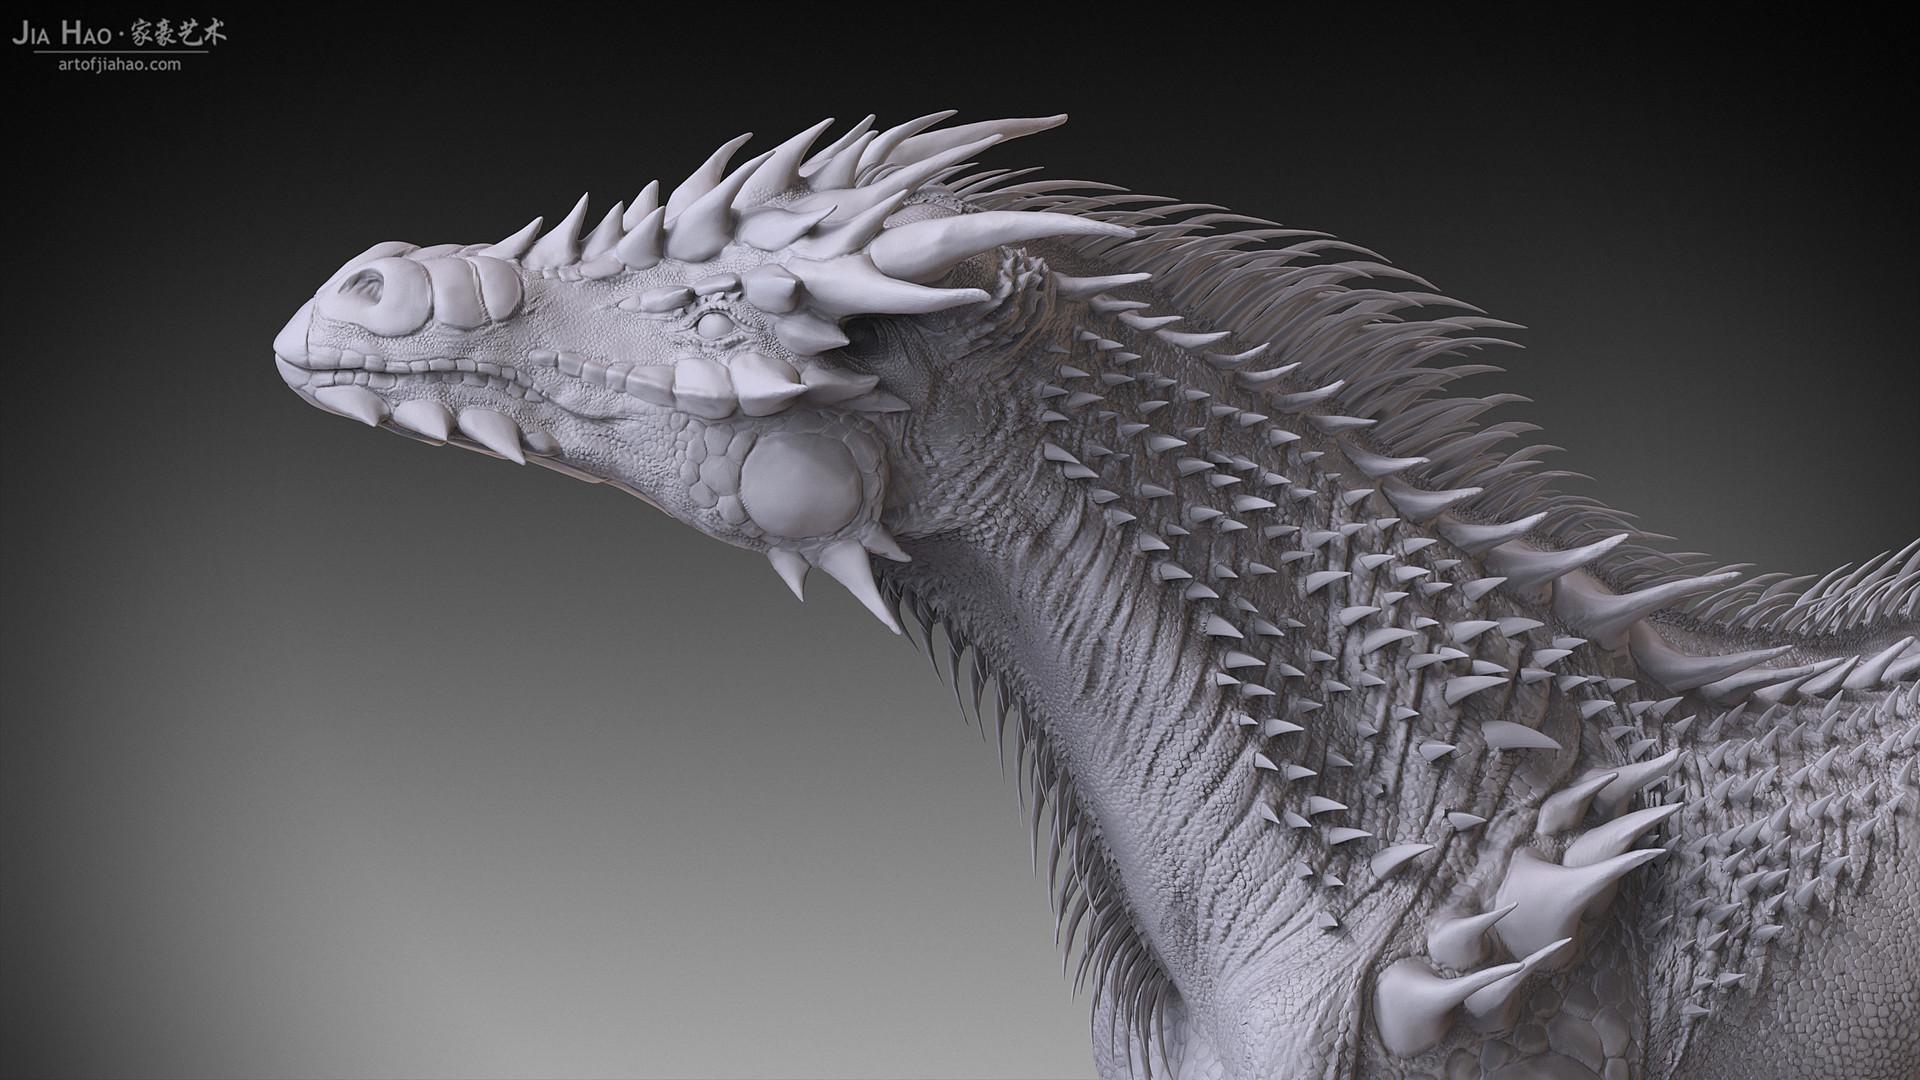 Jia hao dragonhorse 03